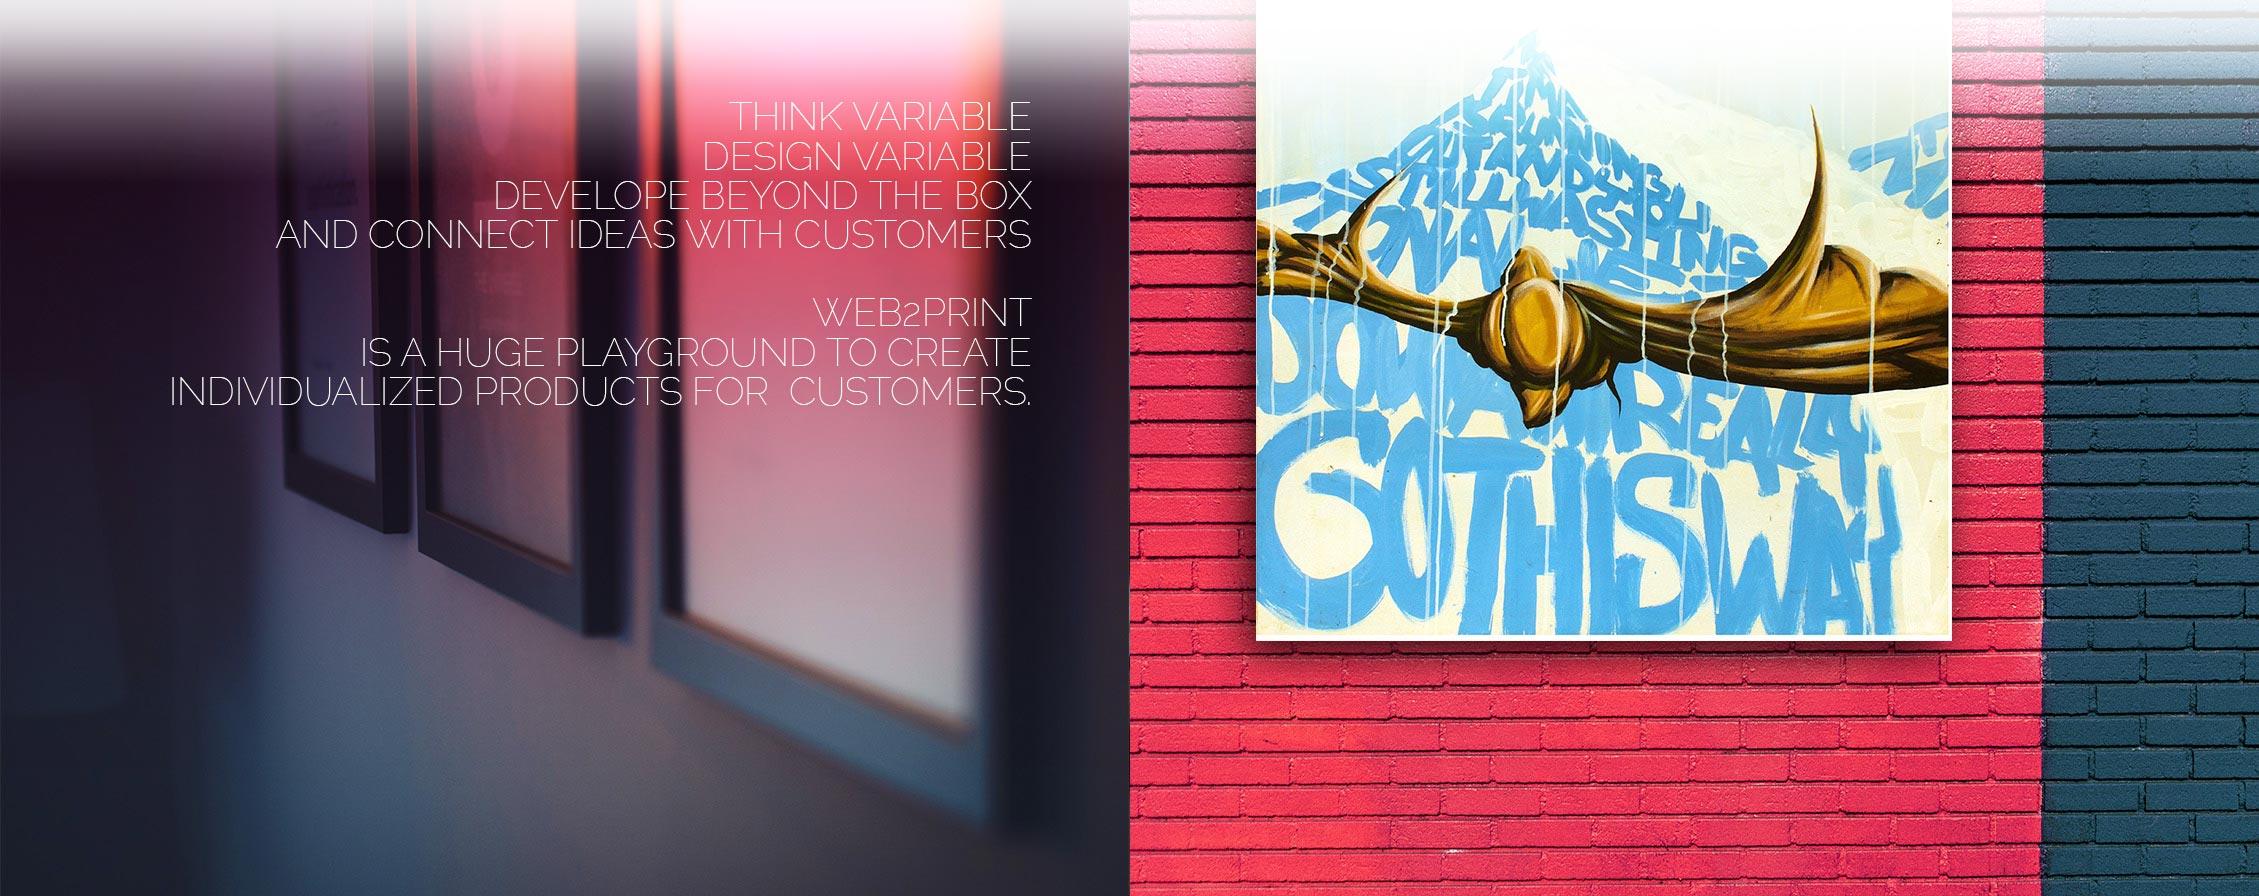 webtoprint web2print agentur templates muenchen agentur v3 english